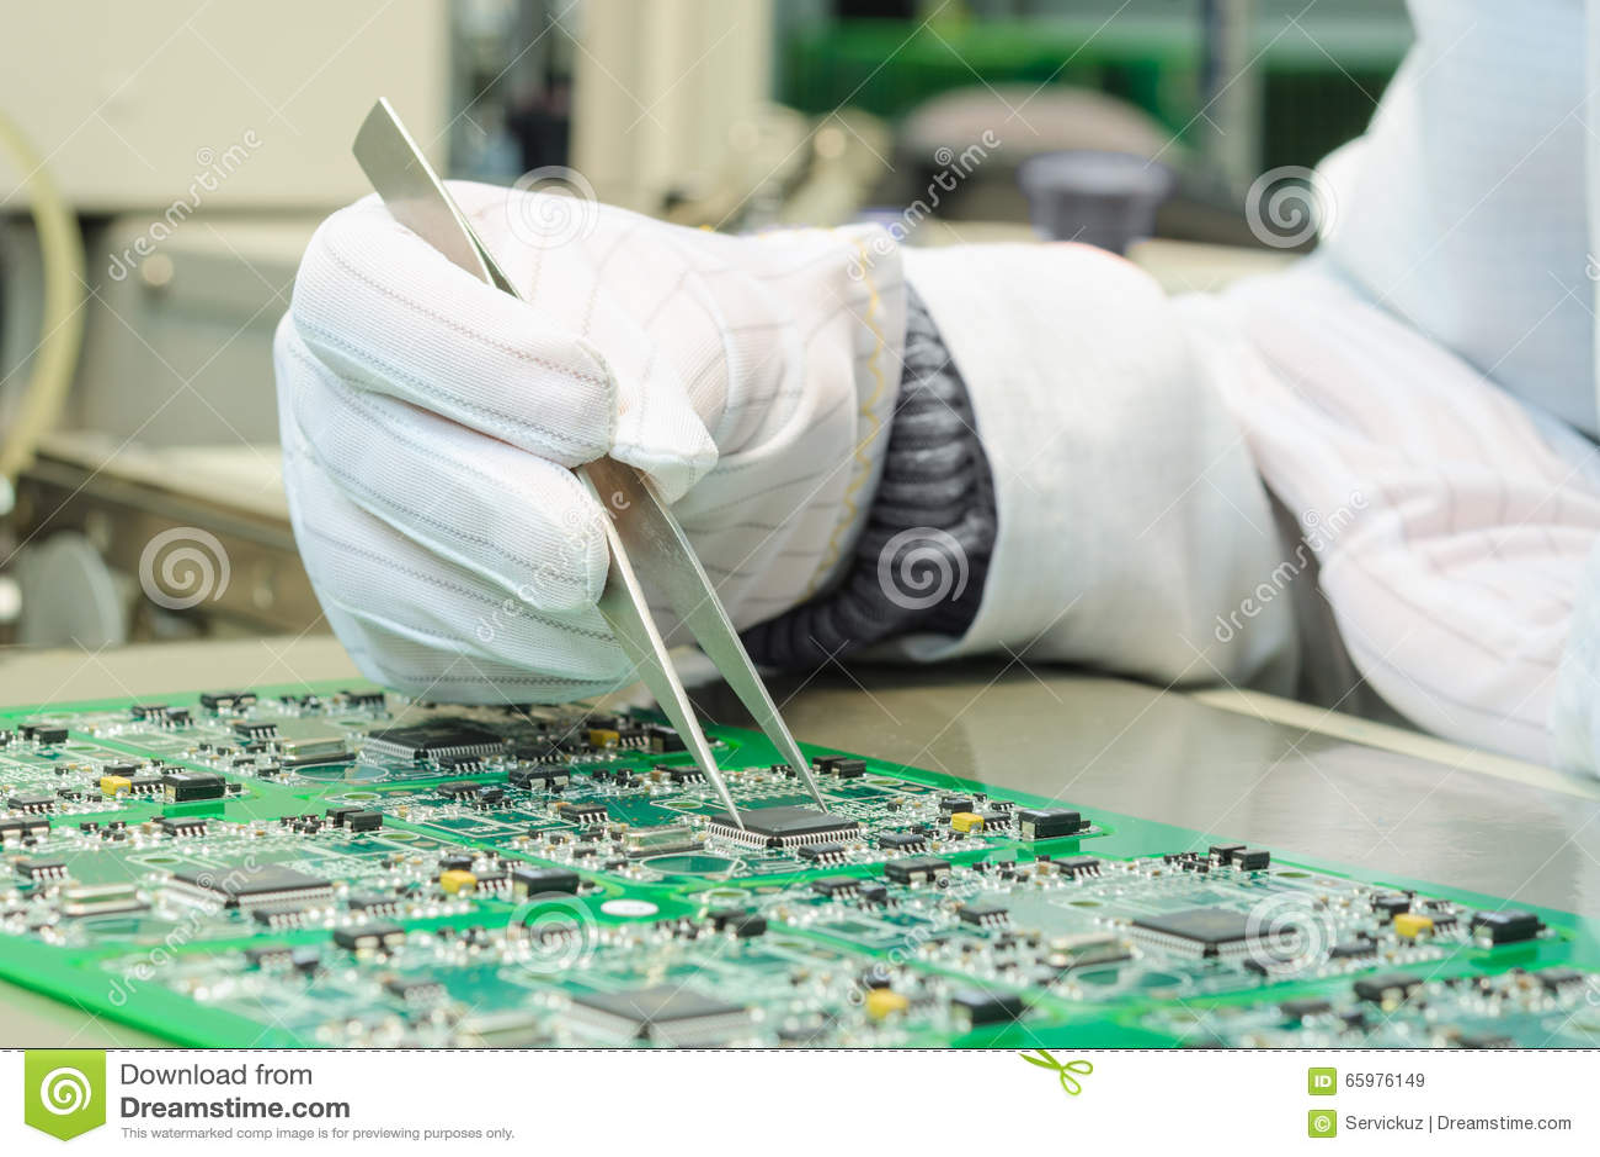 Проверка качества и собрание SMT напечатали компоненты на PCB